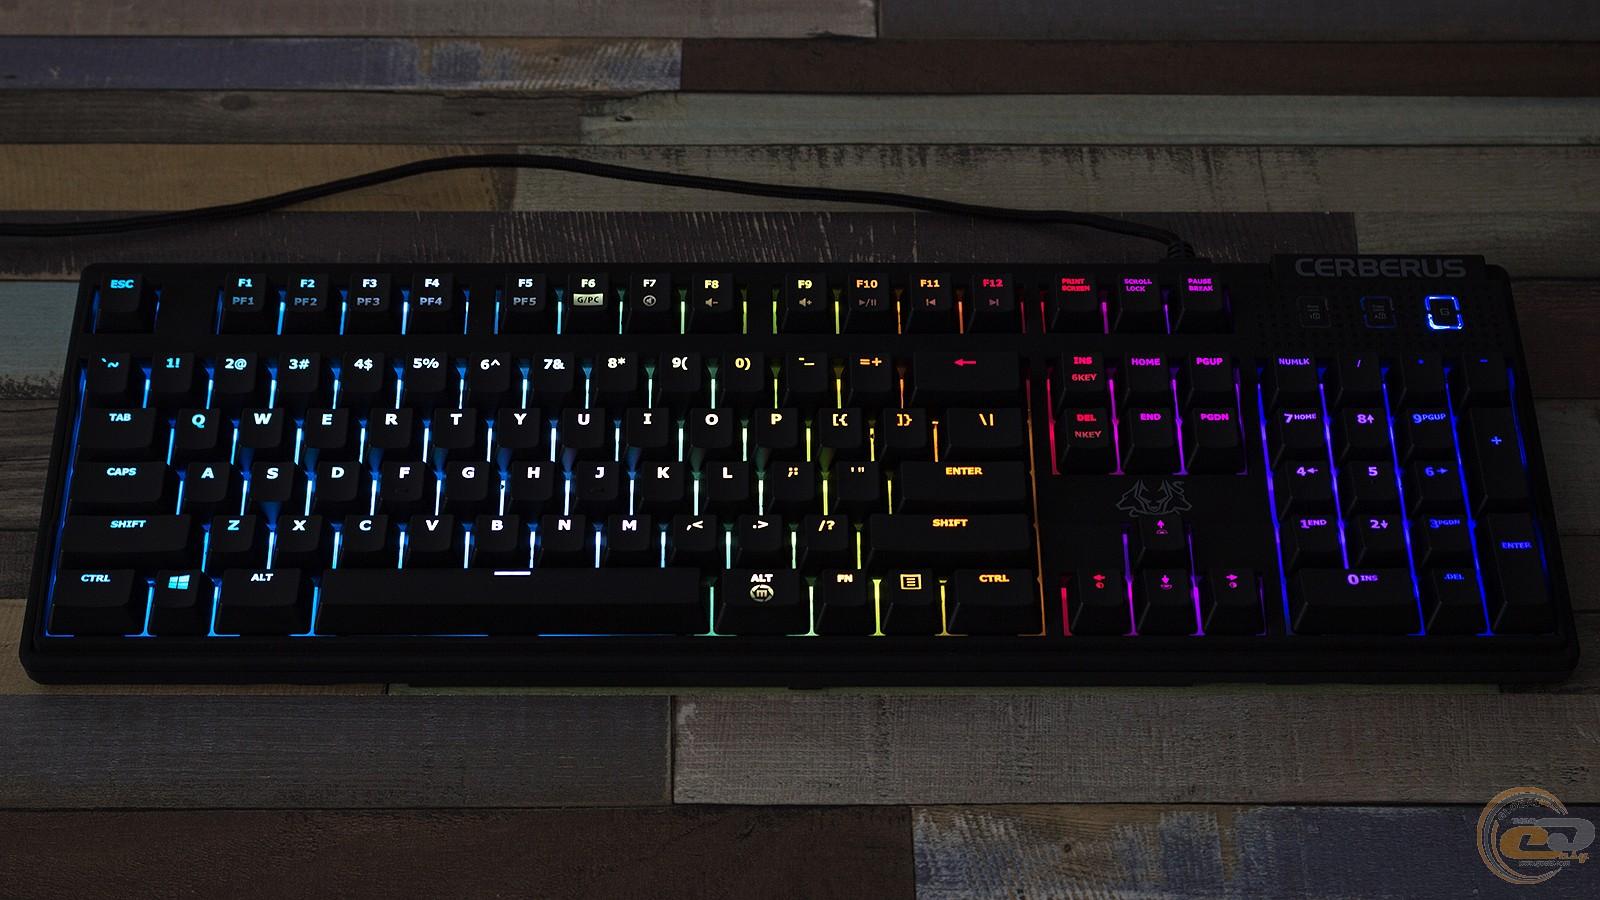 ASUS Cerberus Mech RGB подсветка в темноте